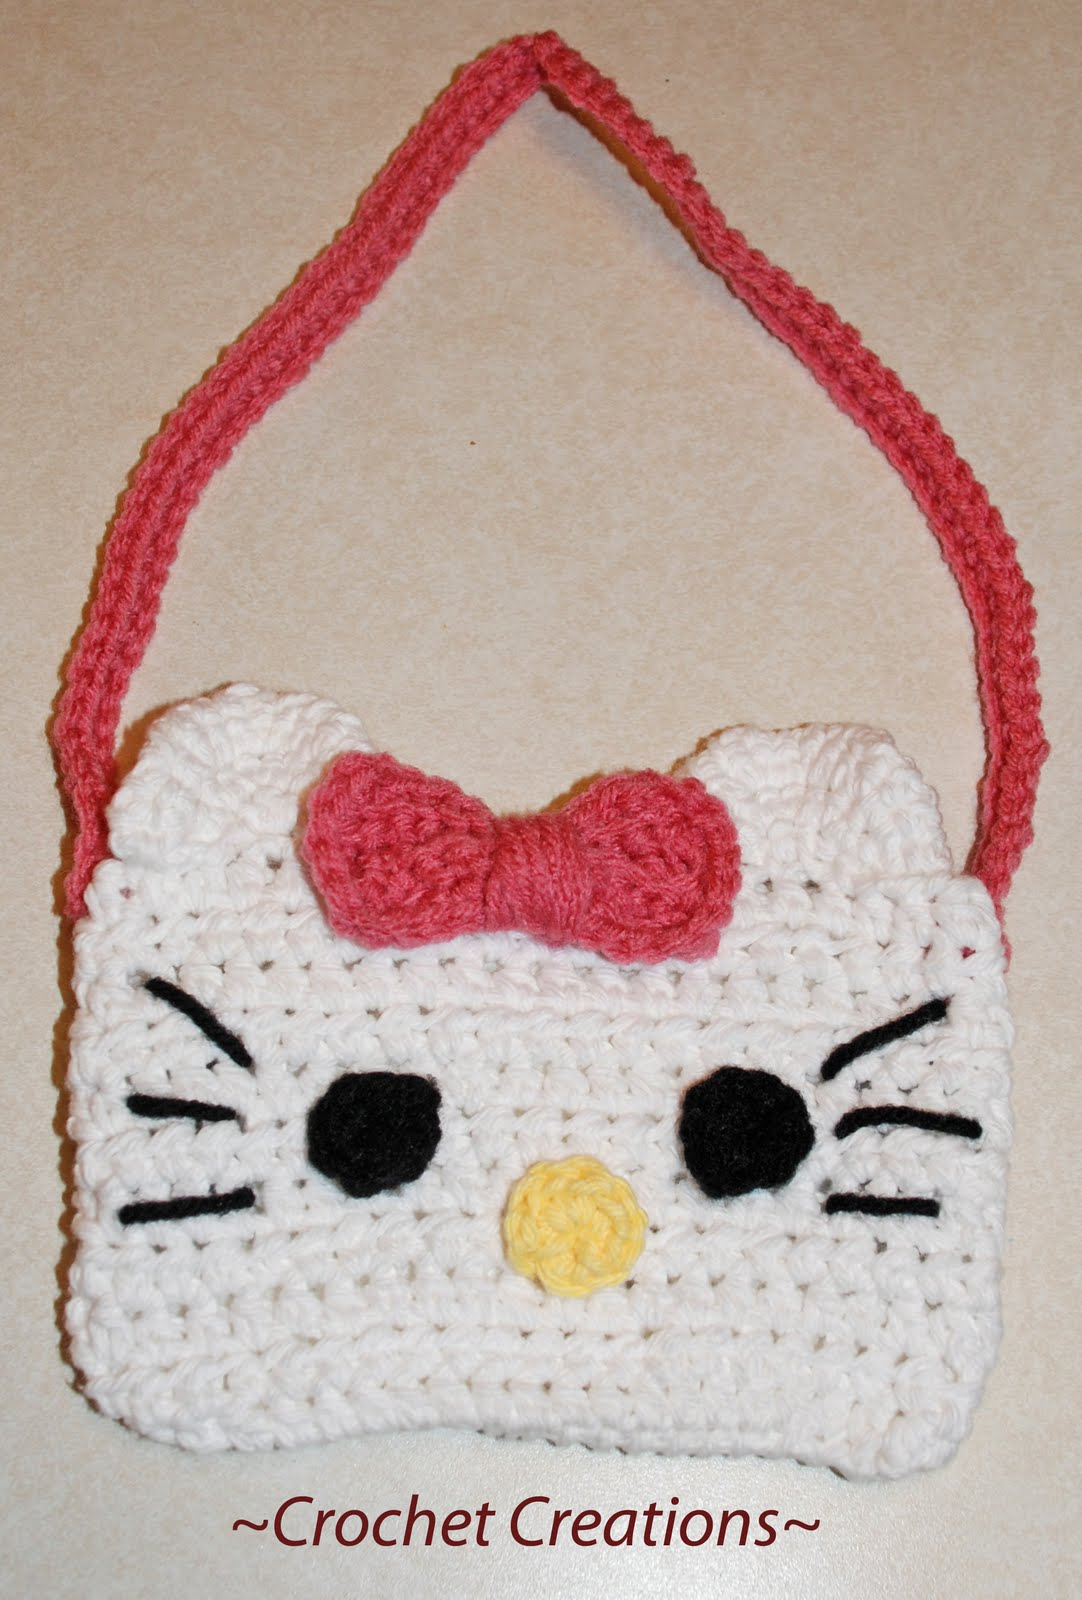 Free Crochet Patterns Hello Kitty Purse : Amys Crochet Creative Creations: Crochet Hello Kitty Purse